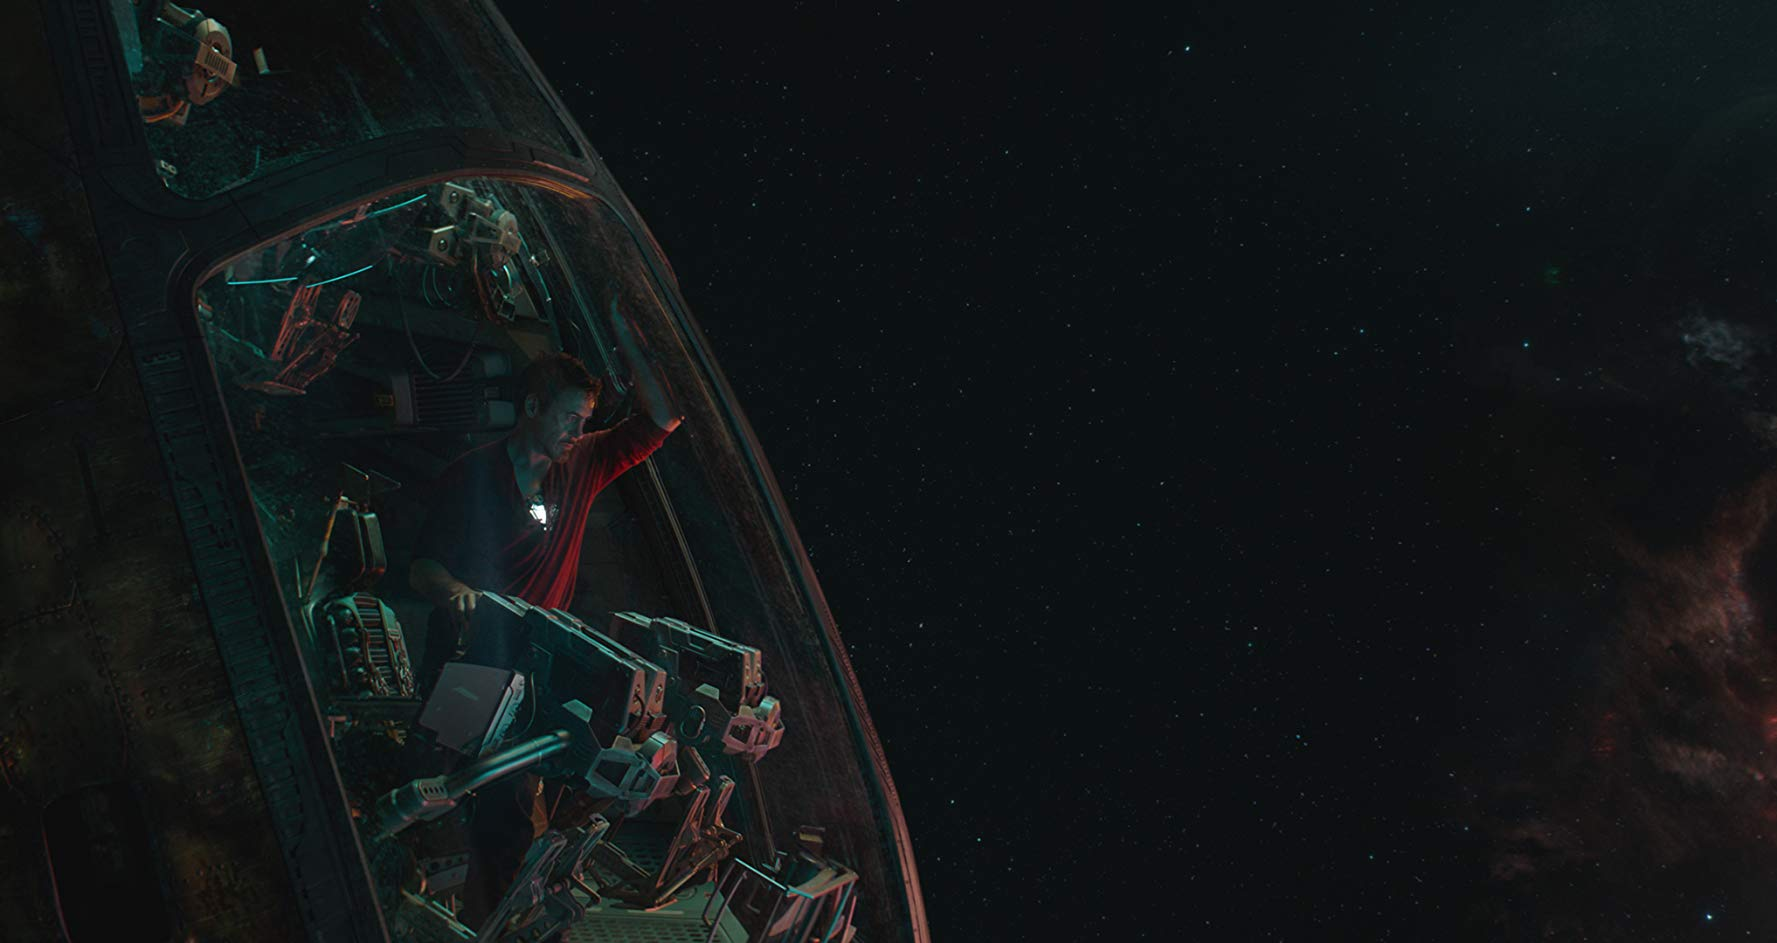 Avengers: Endgame, Atriebēji: Noslēgums